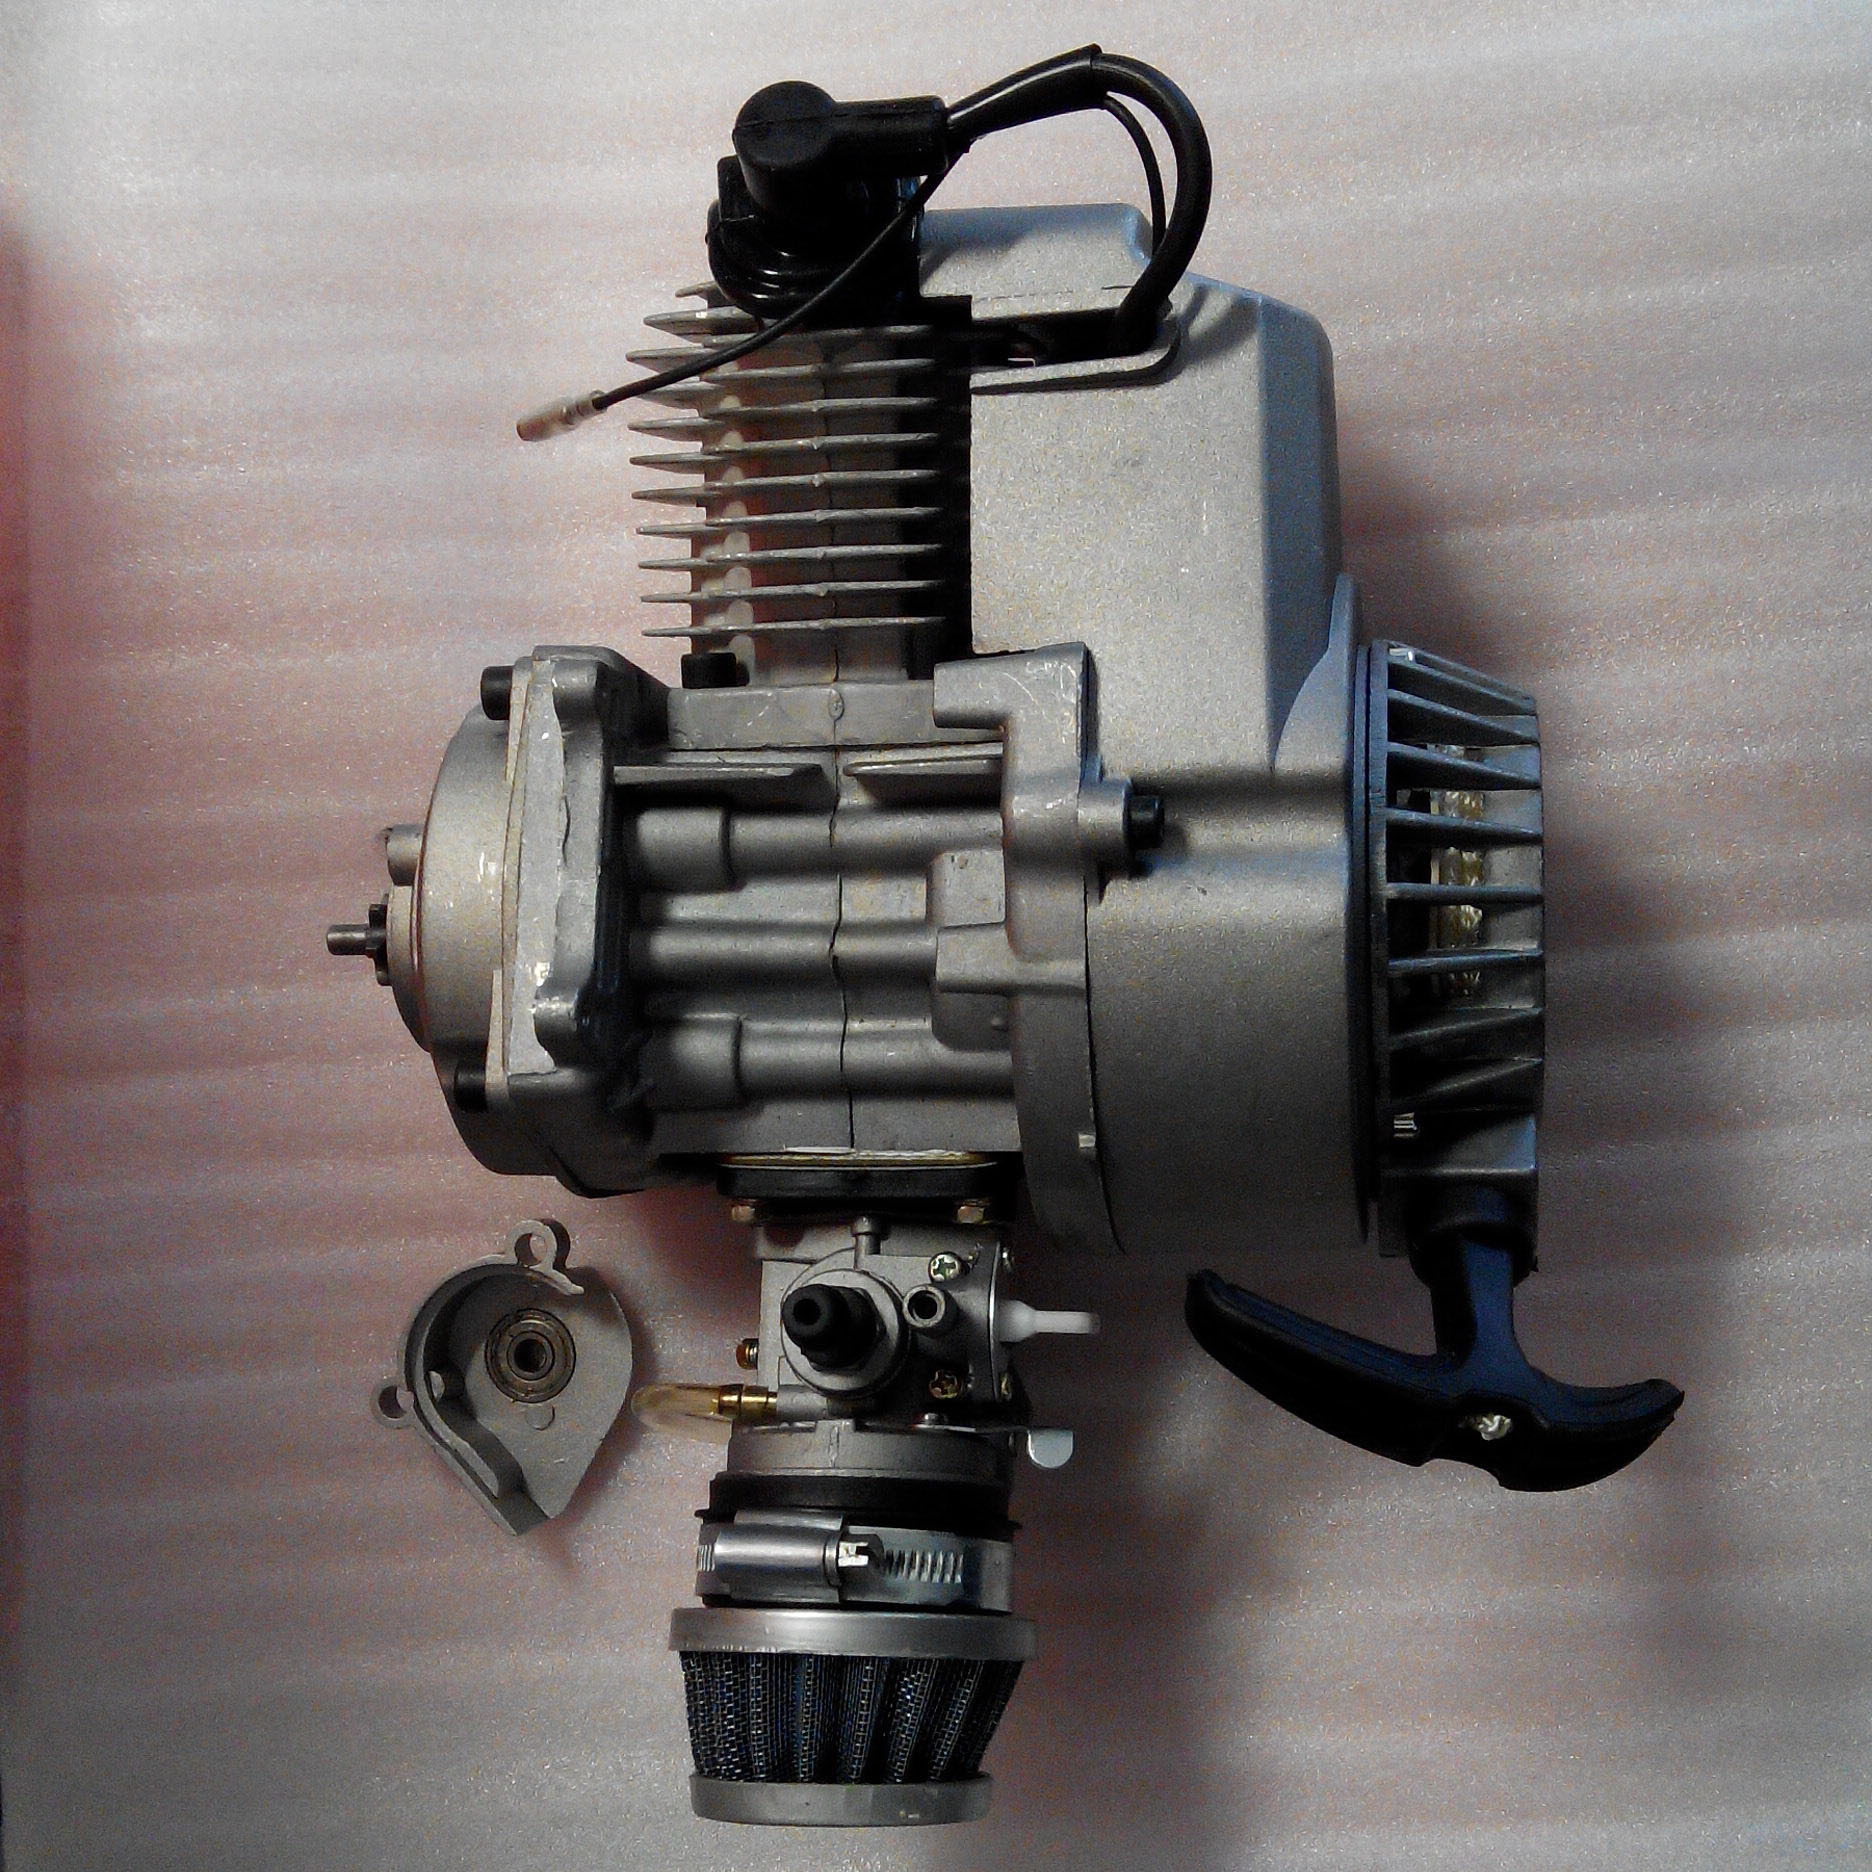 for 47cc 49cc 50cc 2 strokes engine motor mini kid atv. Black Bedroom Furniture Sets. Home Design Ideas